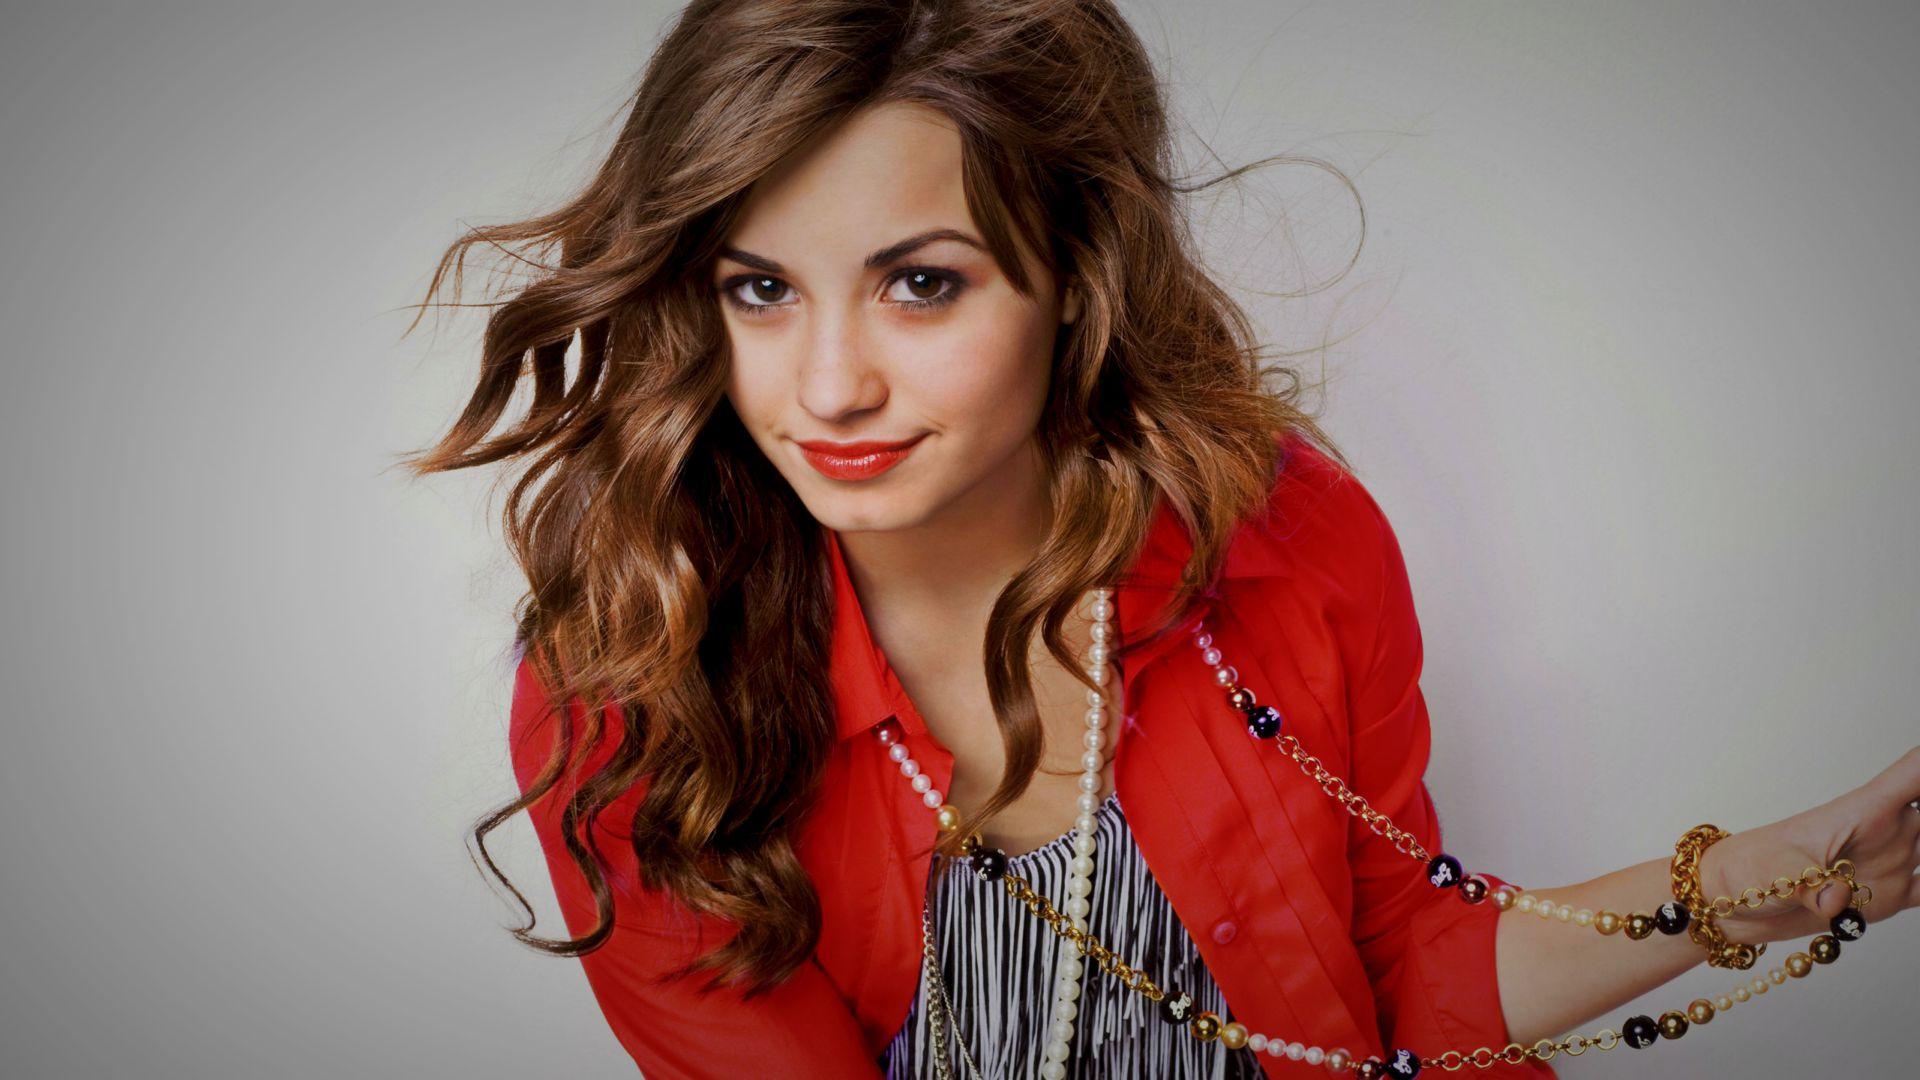 Demi Lovato Wallpapers HD 2015 1920x1080